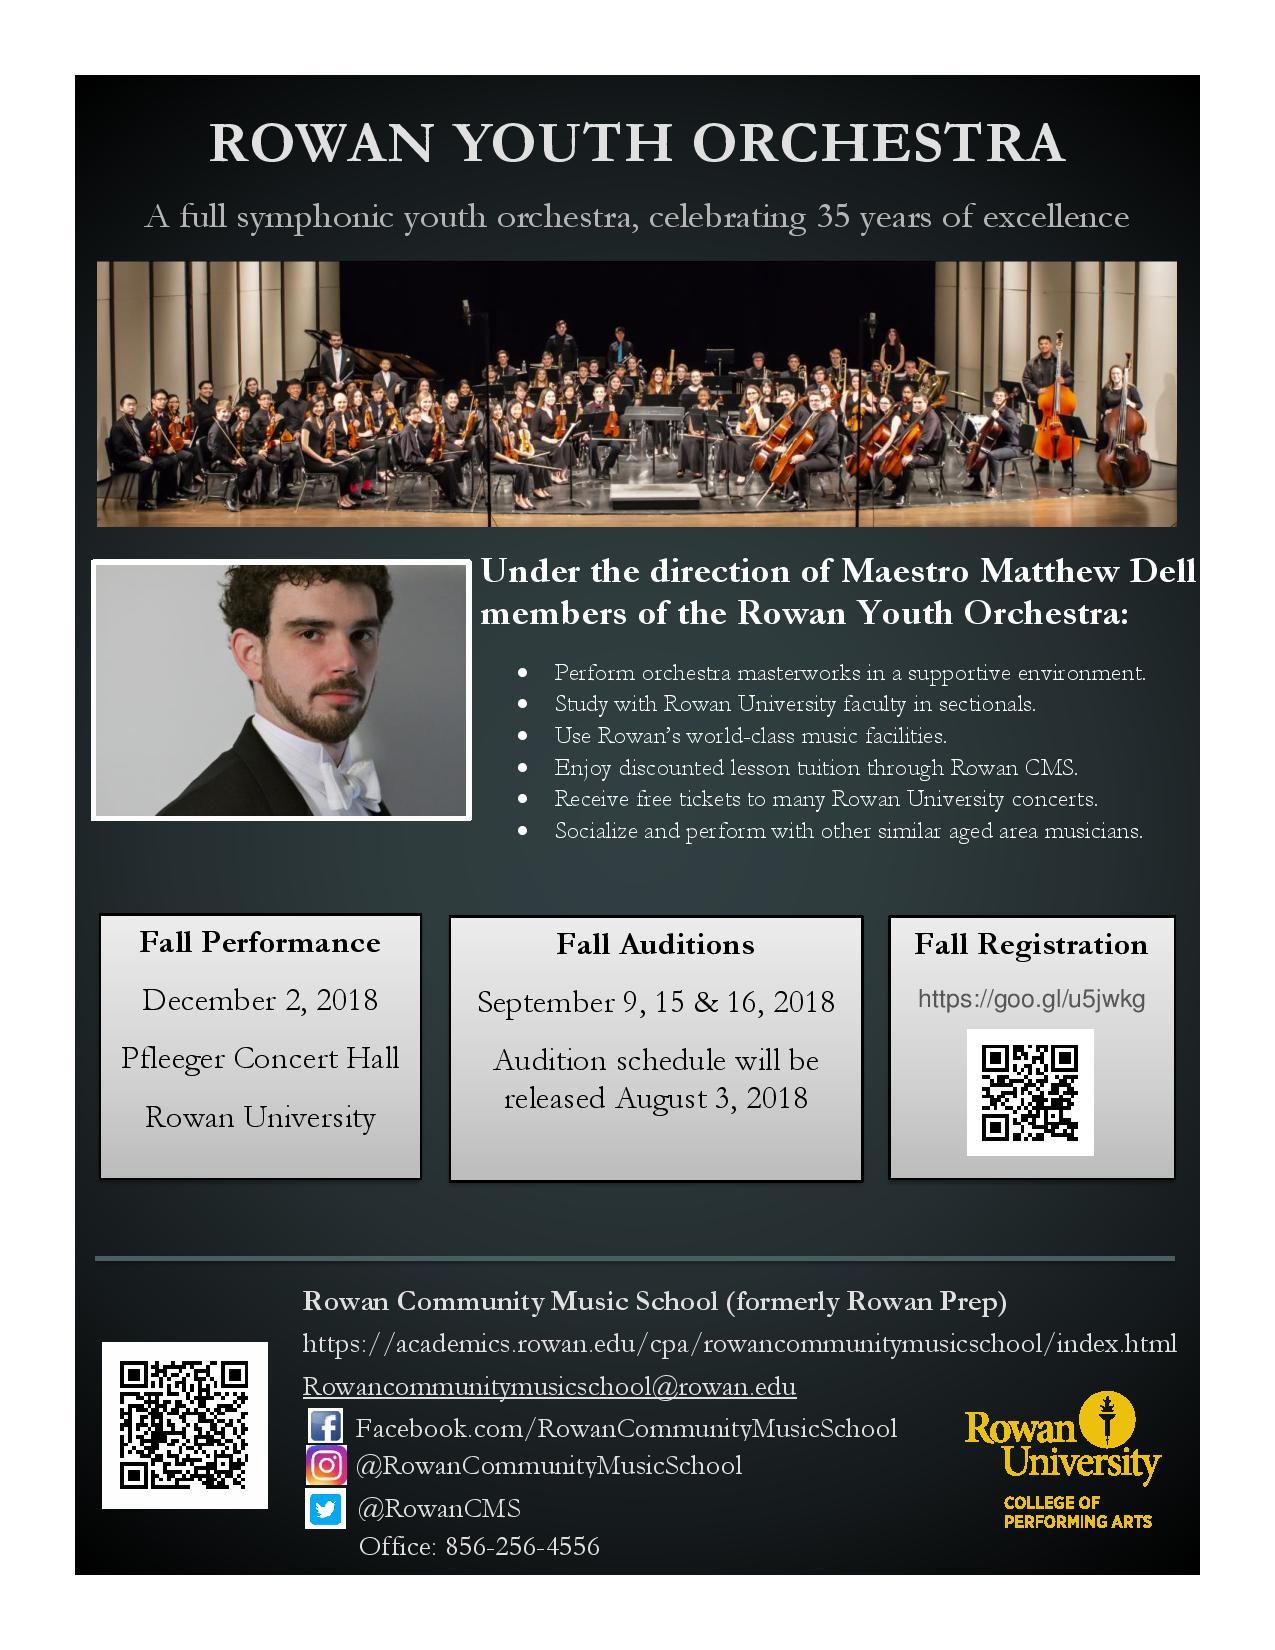 College of Performing Arts   Rowan University